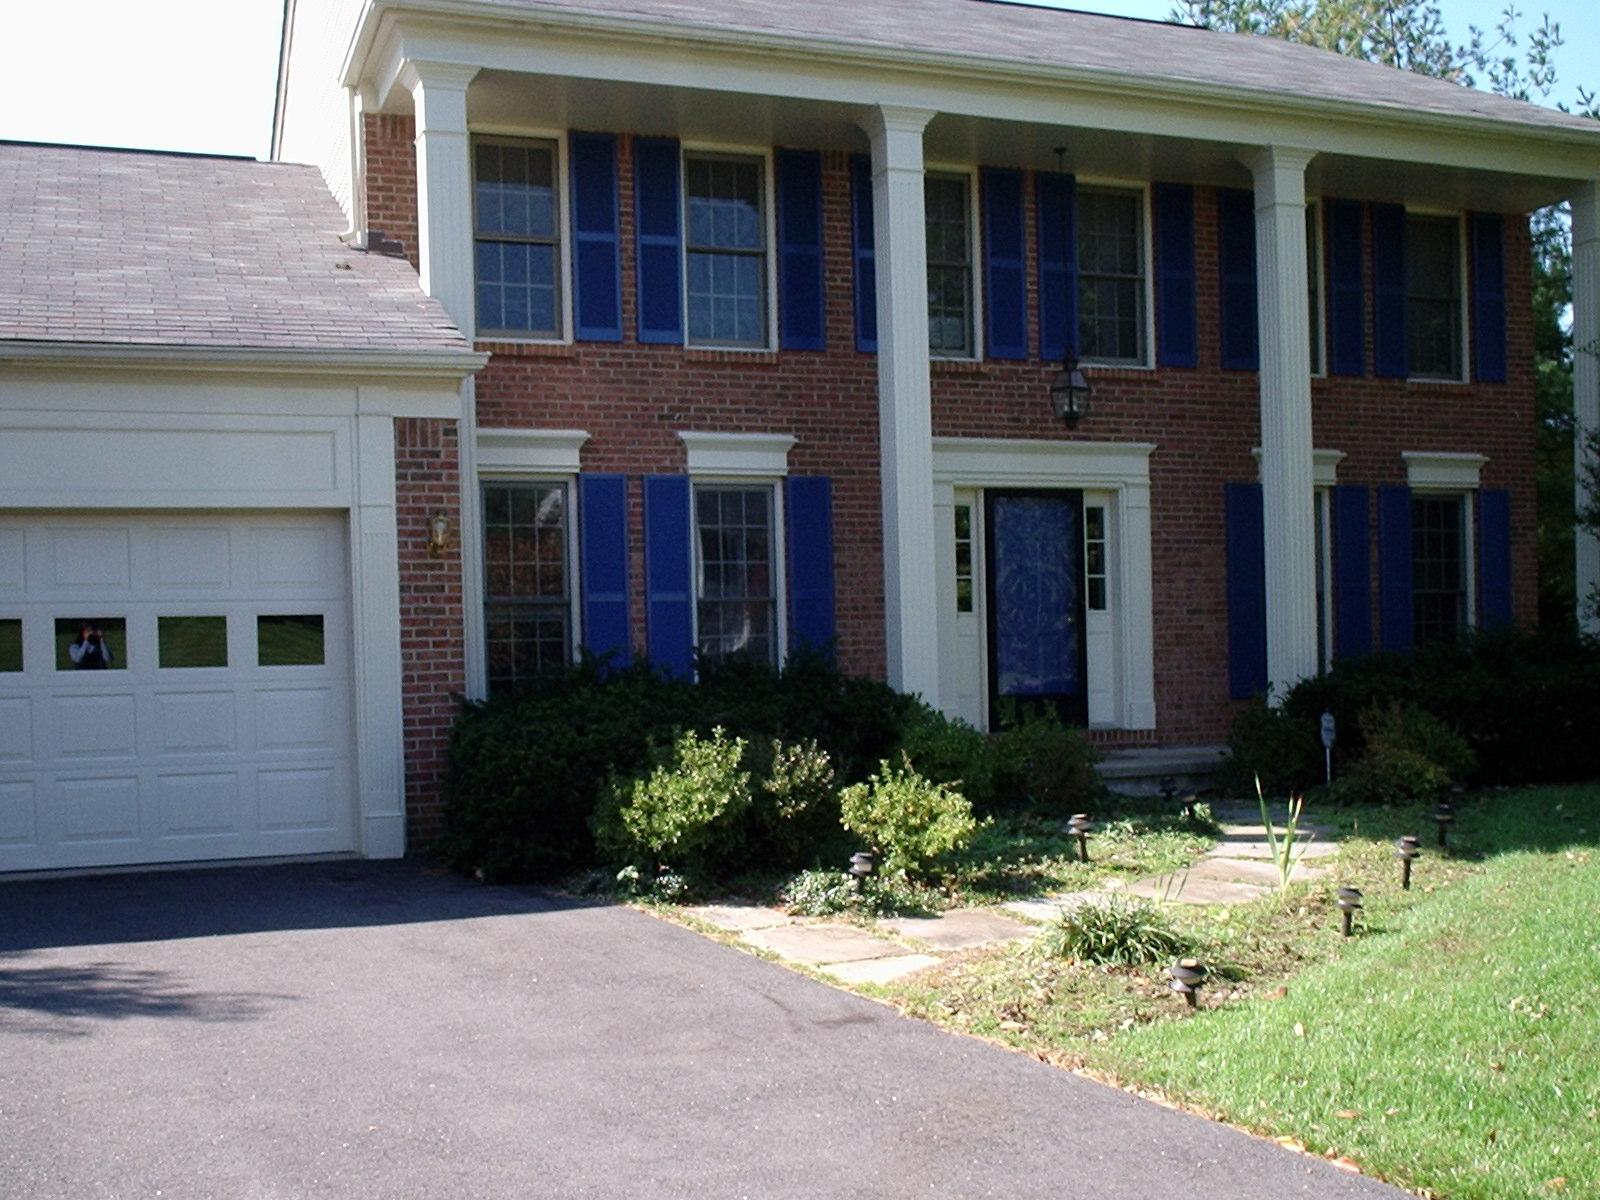 Photo of front walkway